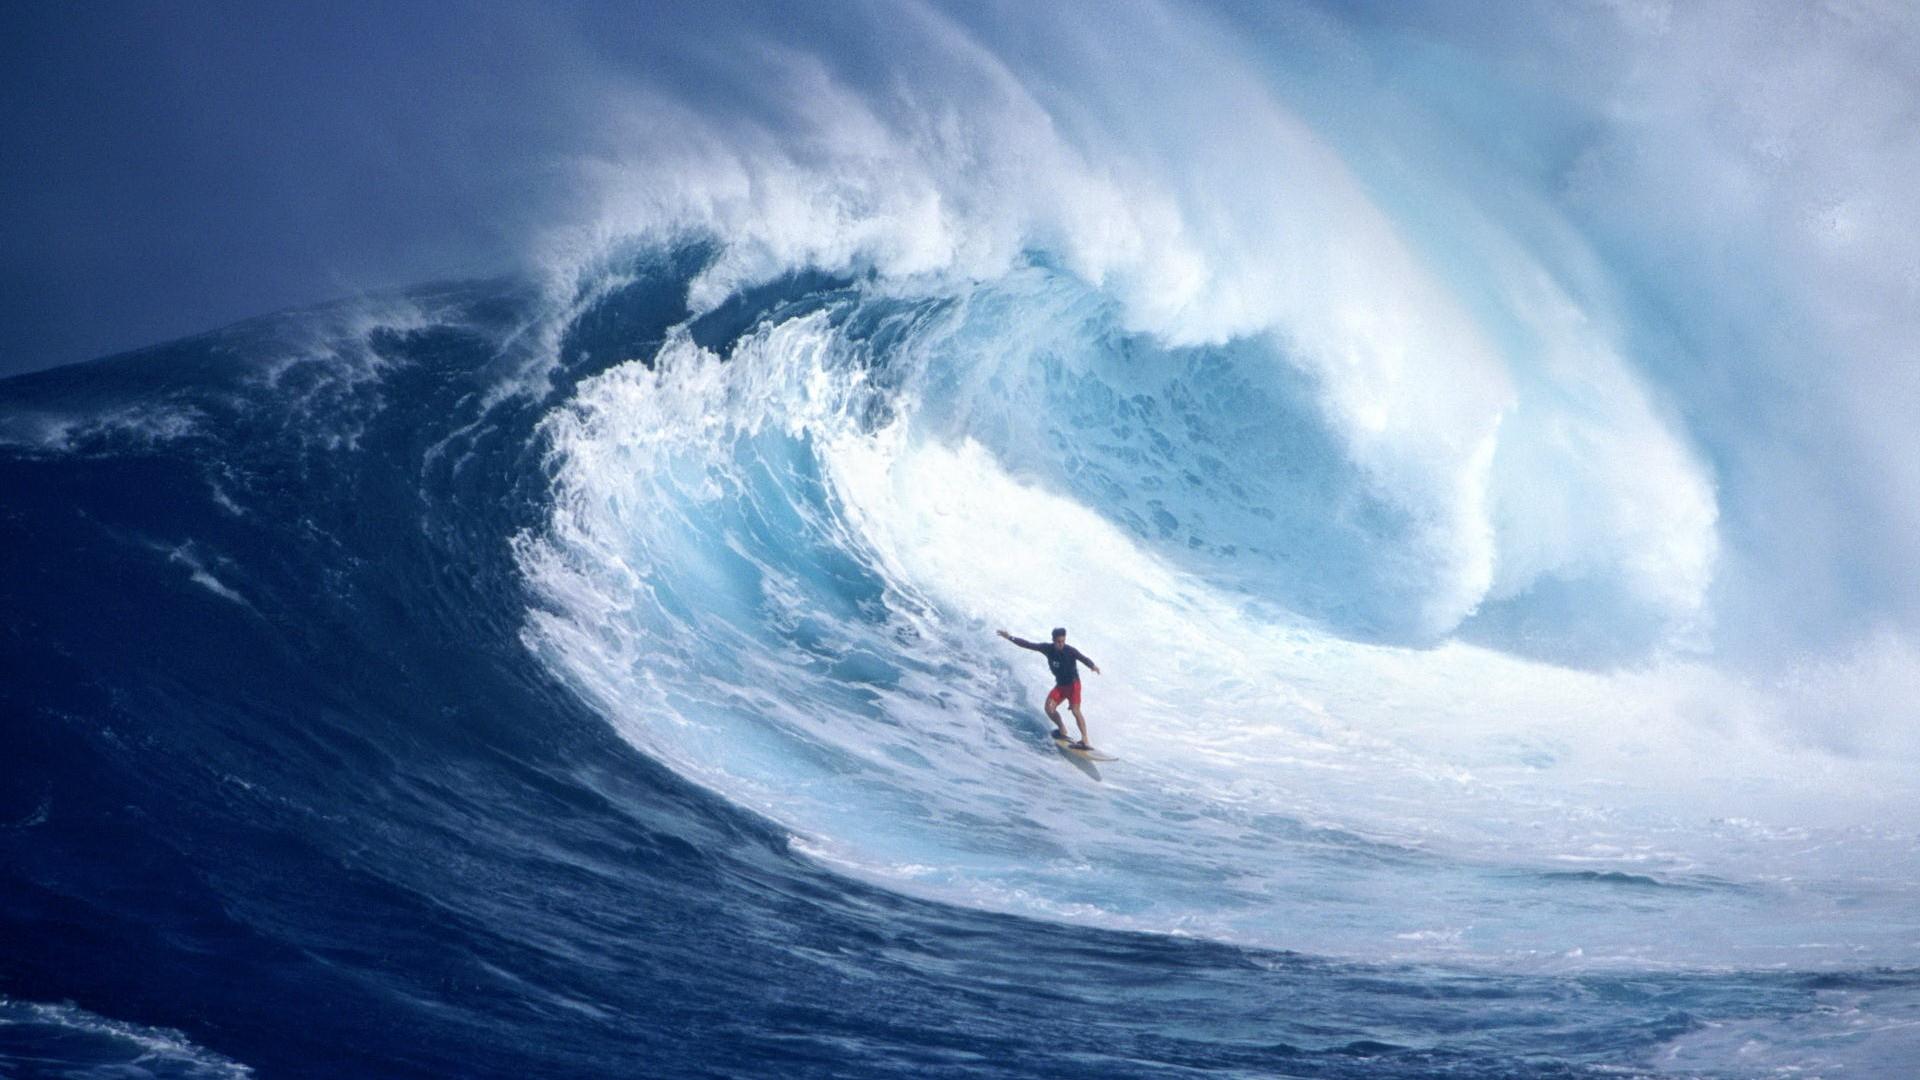 Surf Wallpaper Hd wallpaper   637761 1920x1080